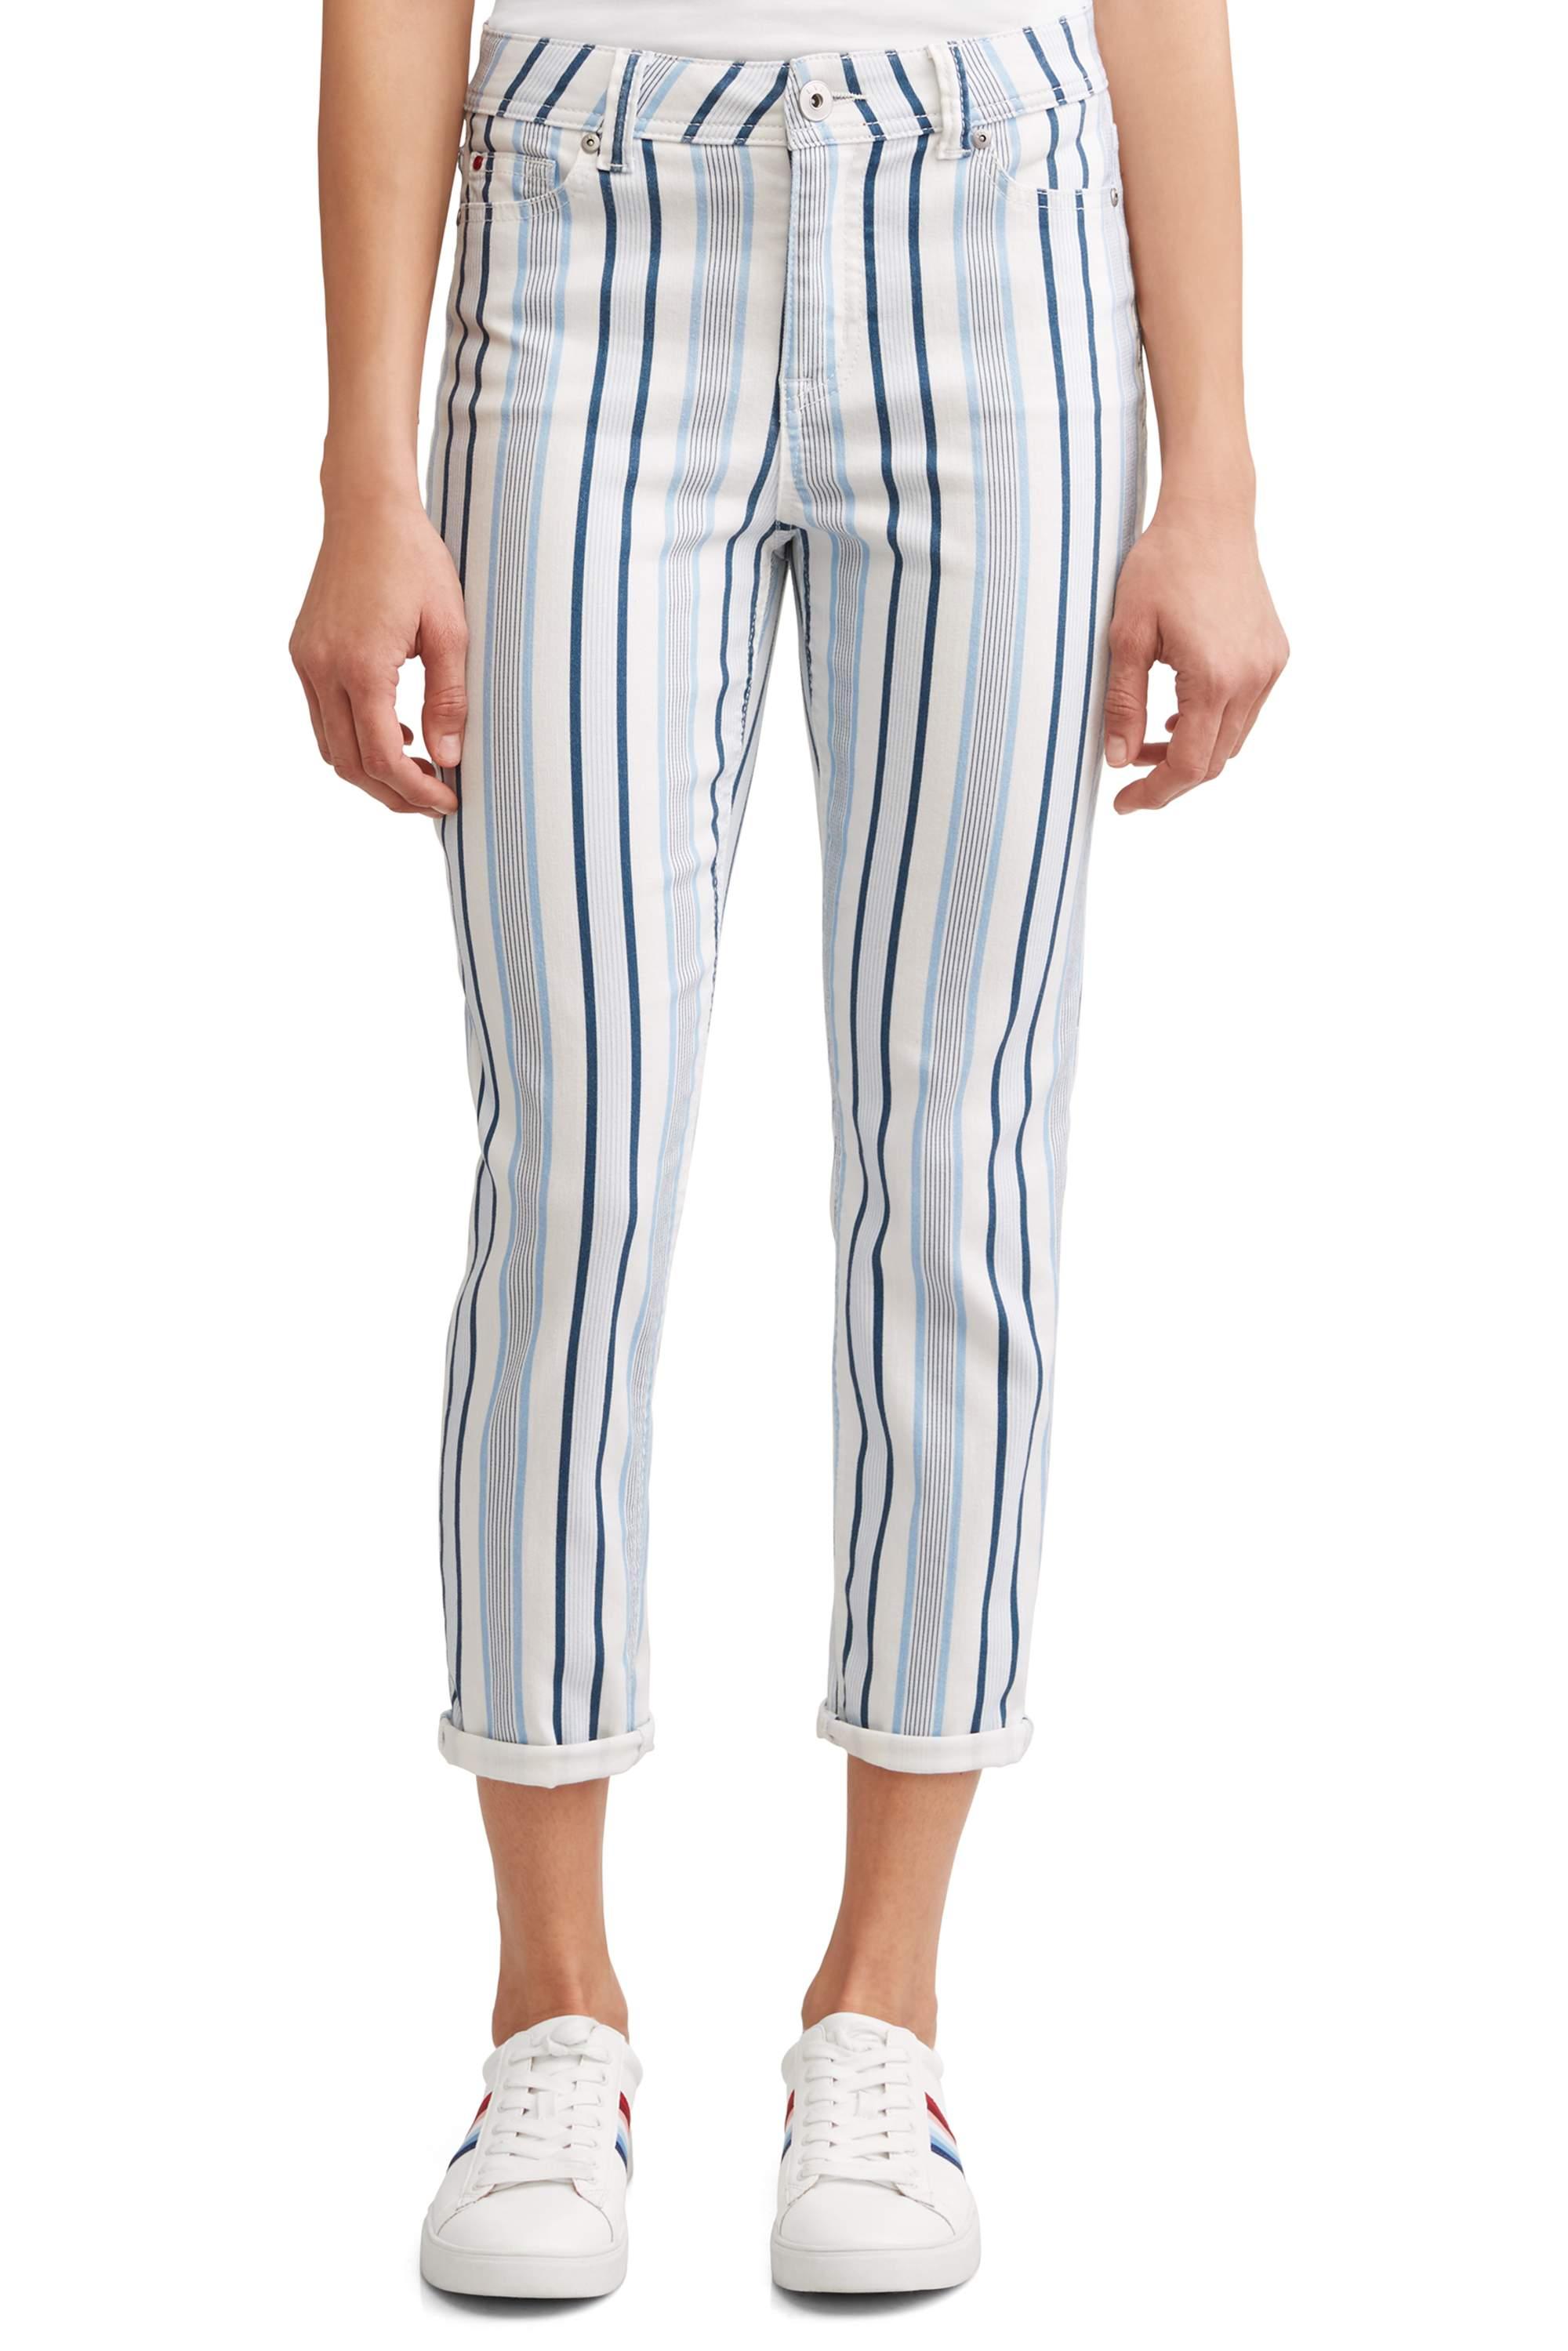 c130d2992549b1 Camo, Stripes, Denim, Oh My! Ellen DeGeneres' Spring Collection Is ...